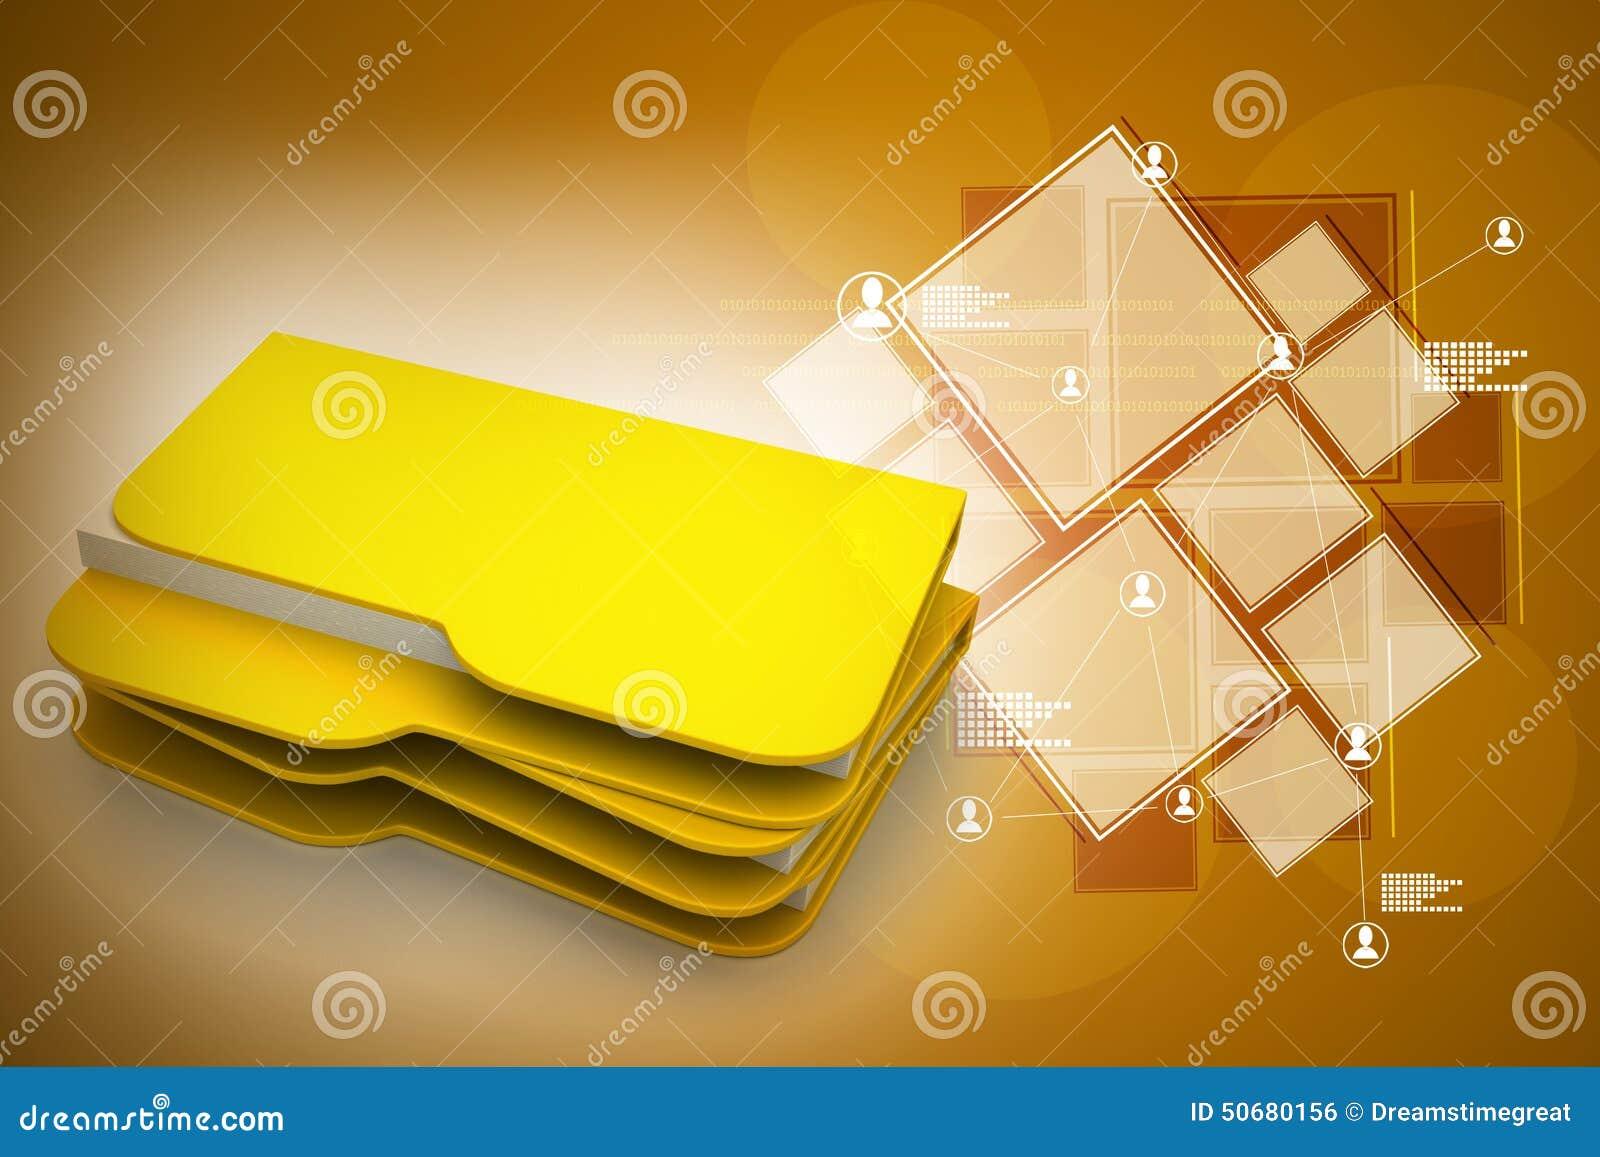 Download 3d计算机文件 库存例证. 插画 包括有 文件夹, 黄色, 计算机, 颜色, 服务, 例证, 尺寸, 技术 - 50680156